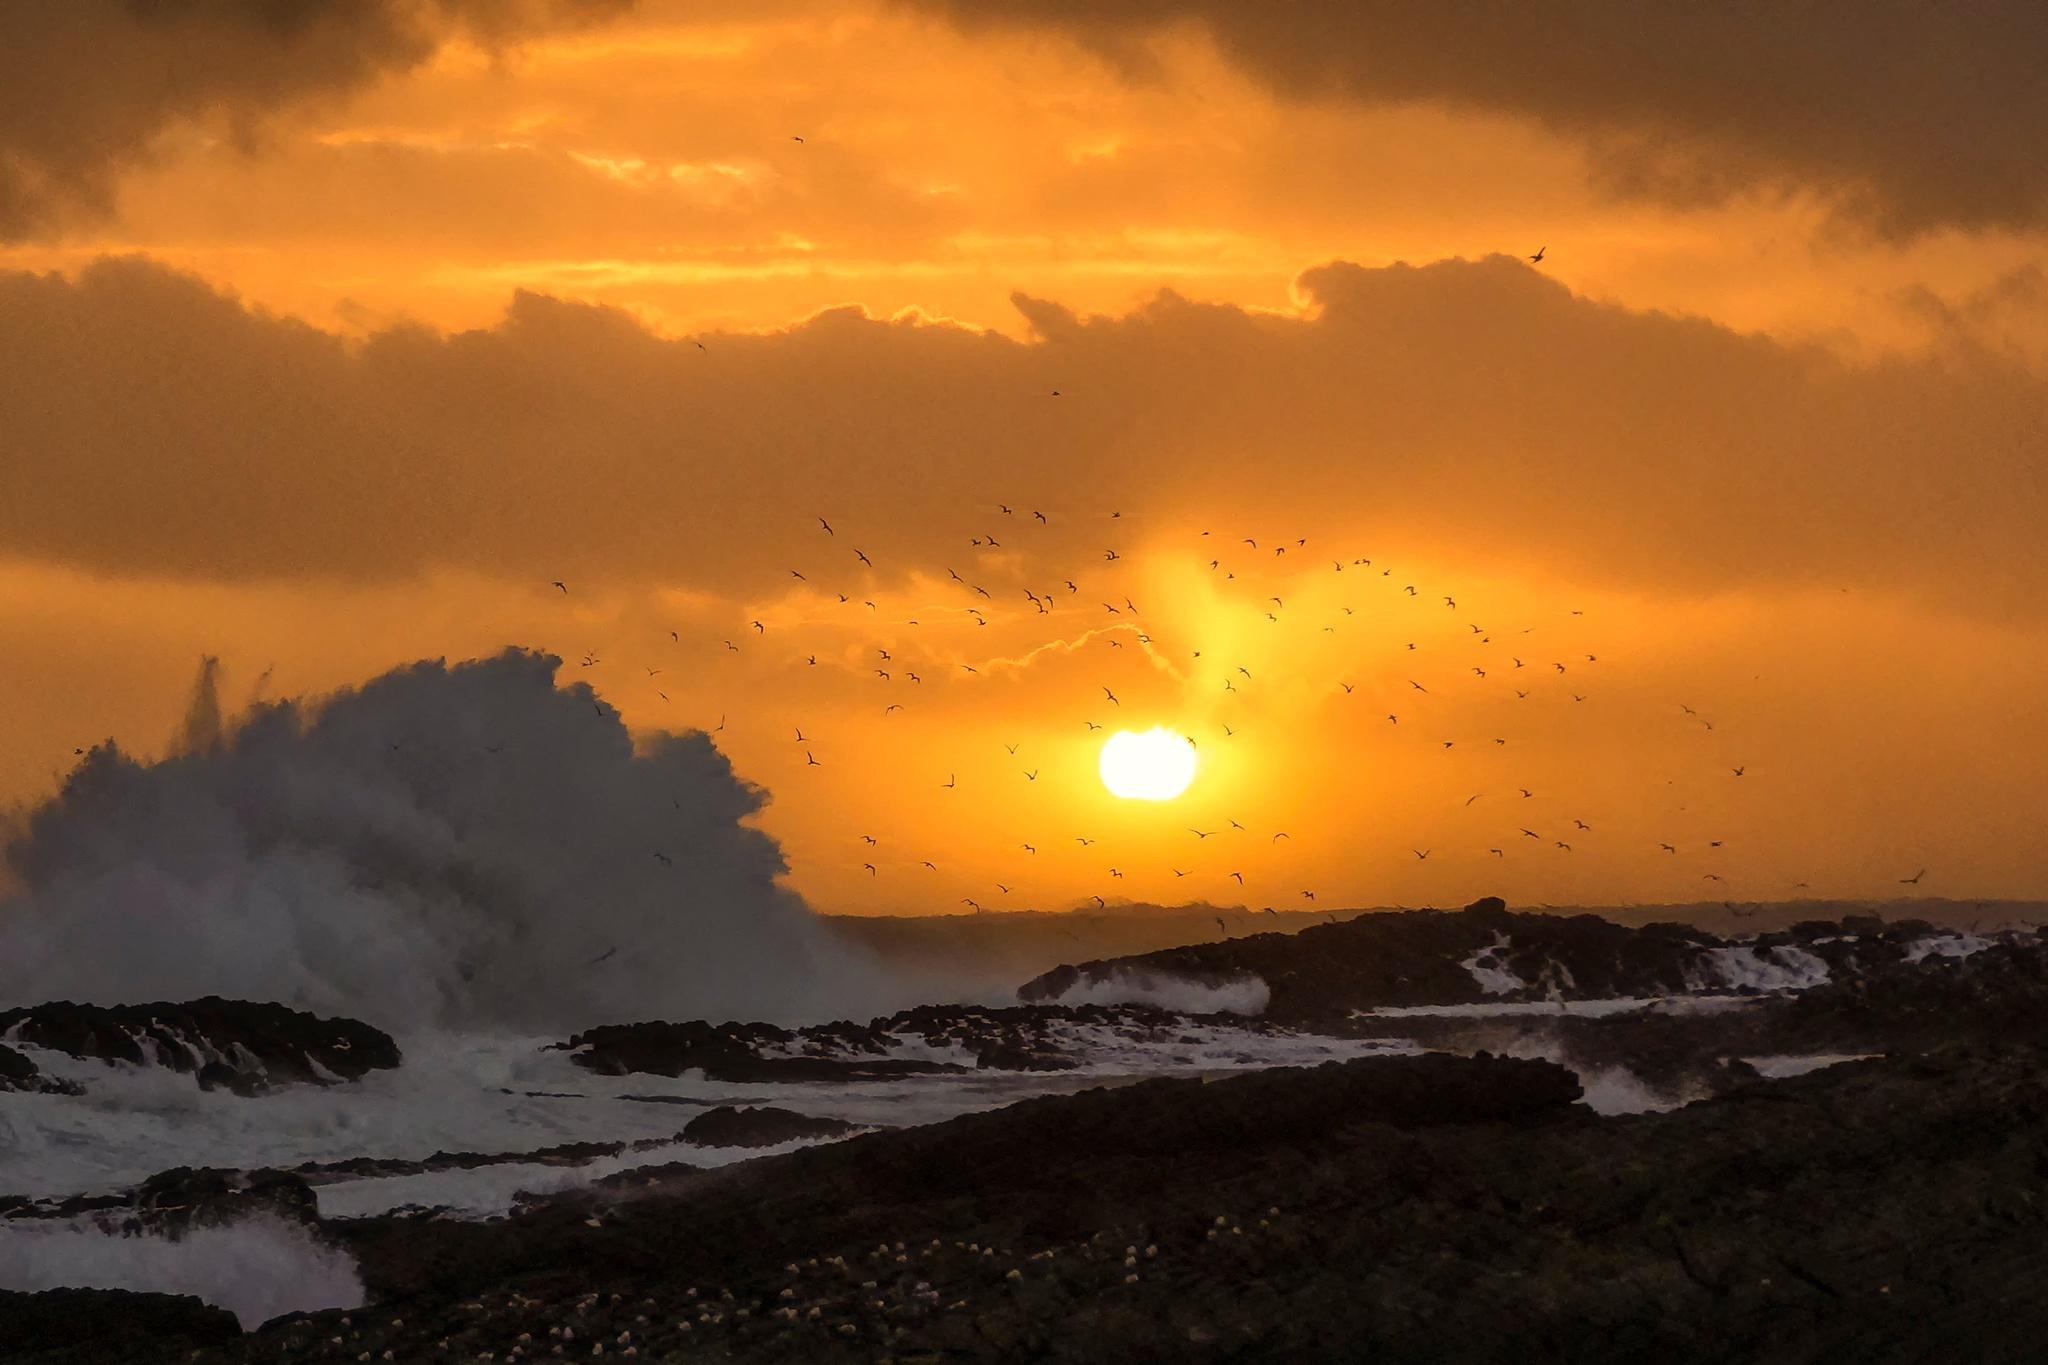 Tsitsikamma sunset by Markus Scholz